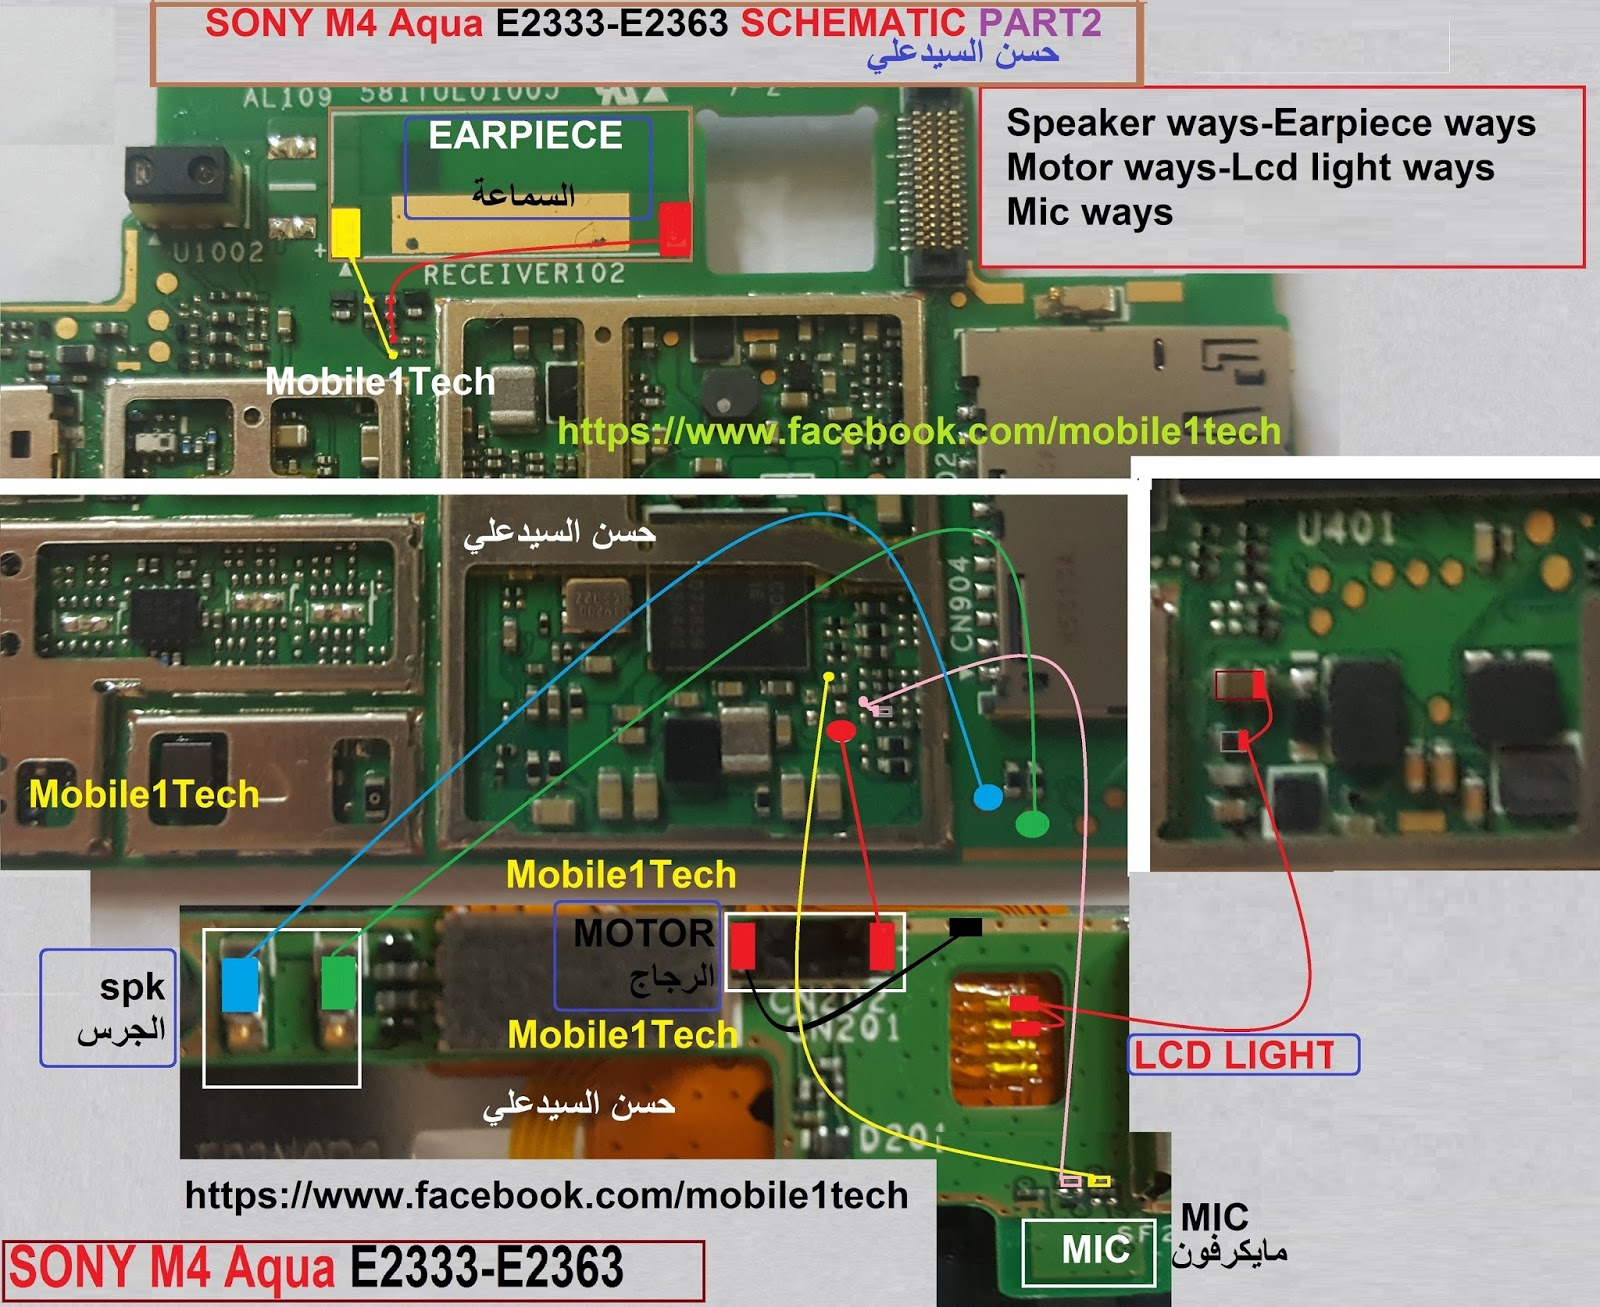 medium resolution of sony m4 aqua full schematic mobile1tech rh mobil1tech blogspot com sony ericsson xperia sony xperia m4